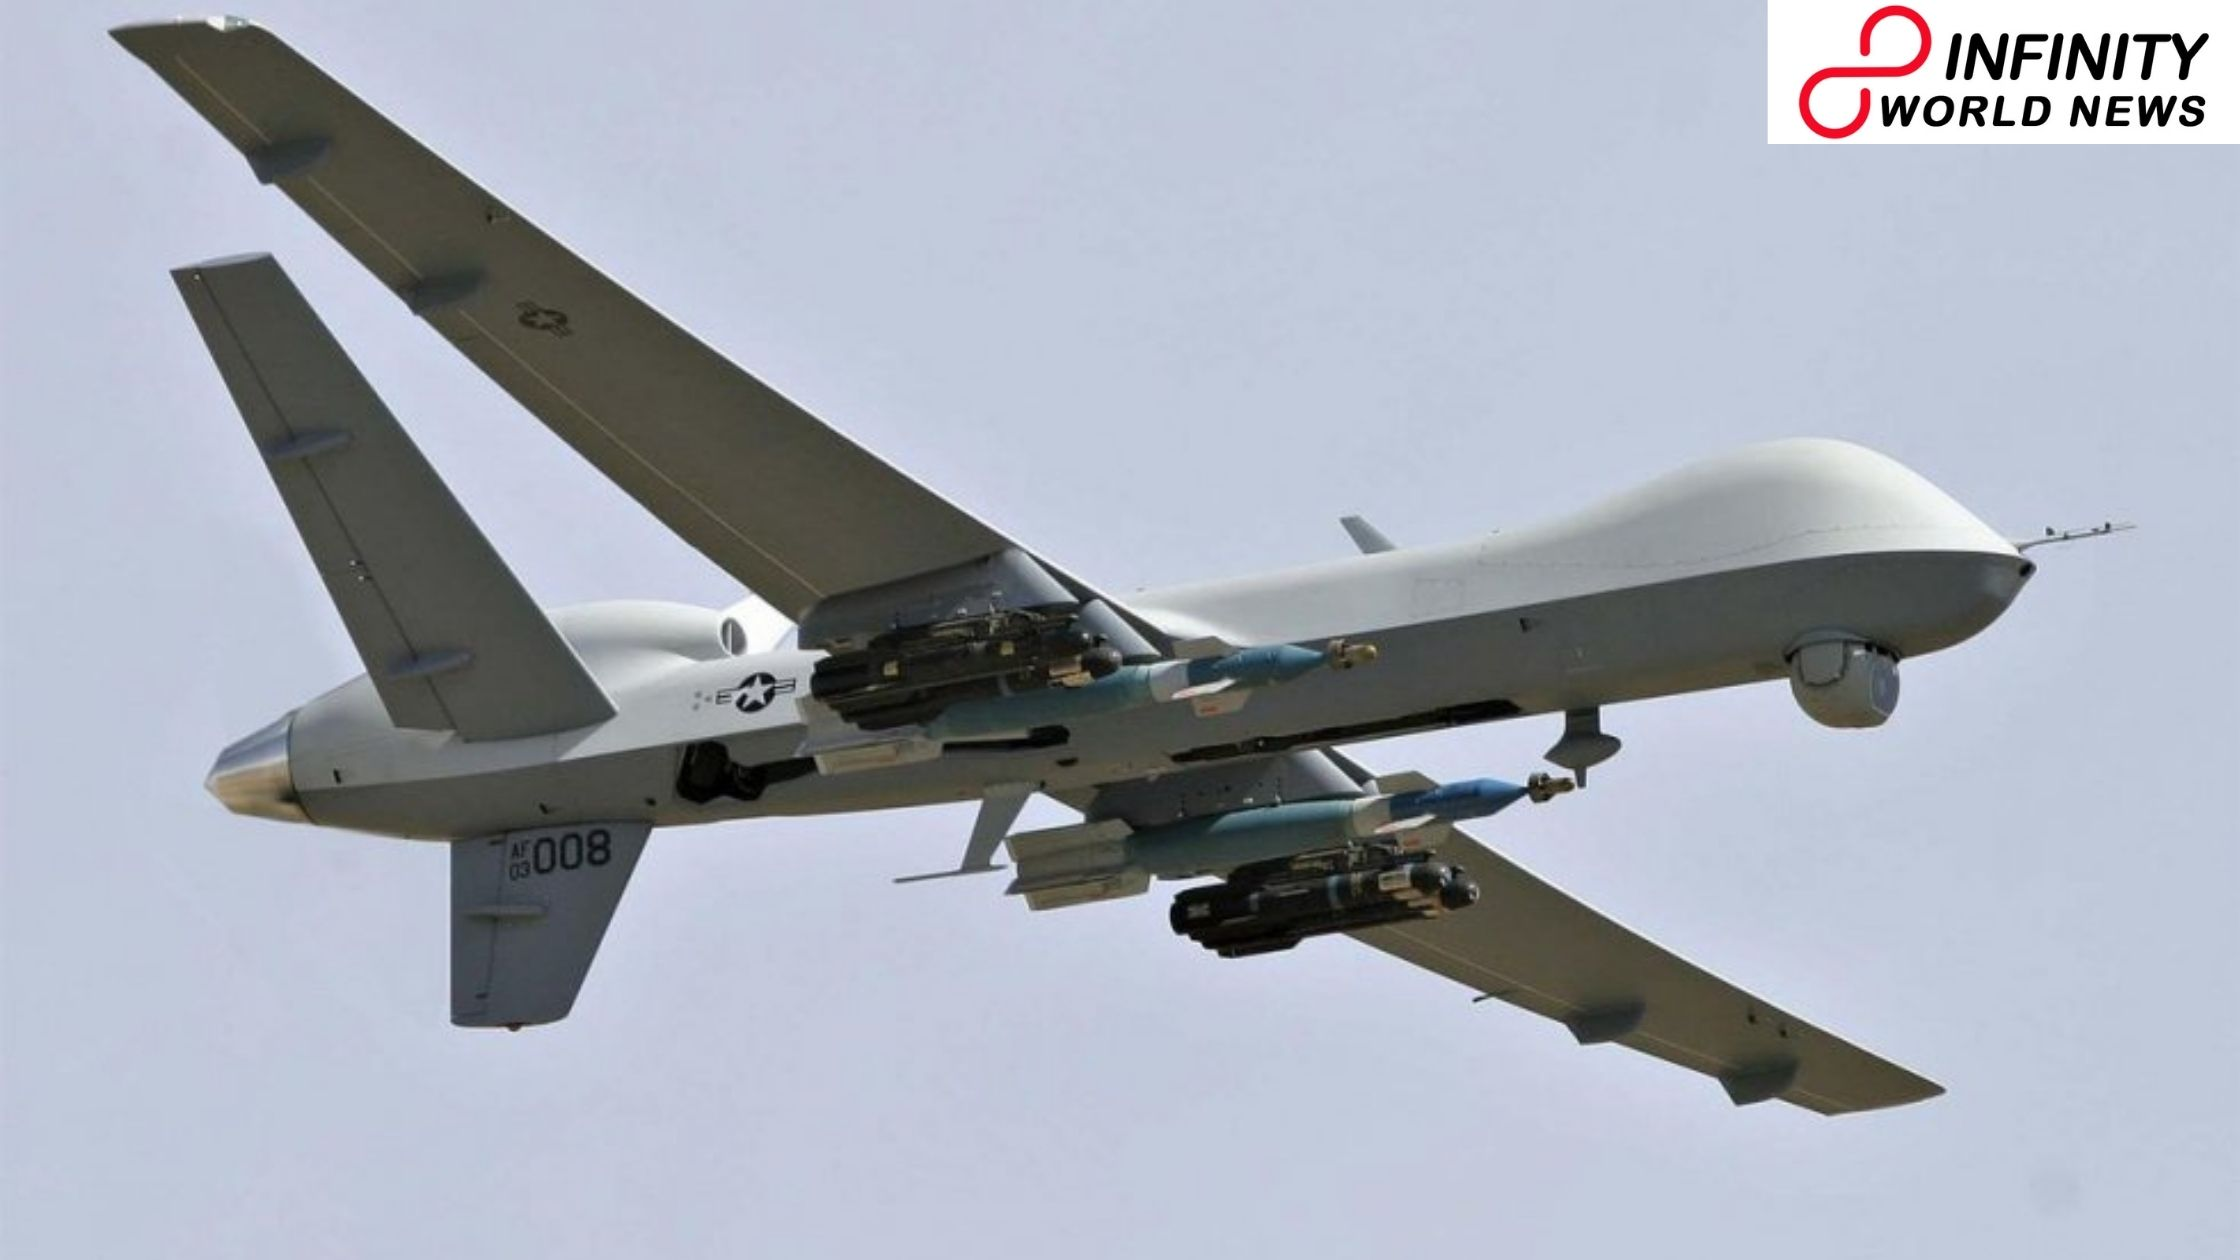 India leases Hi-tech US maritime drones to help reconnaissance, intel